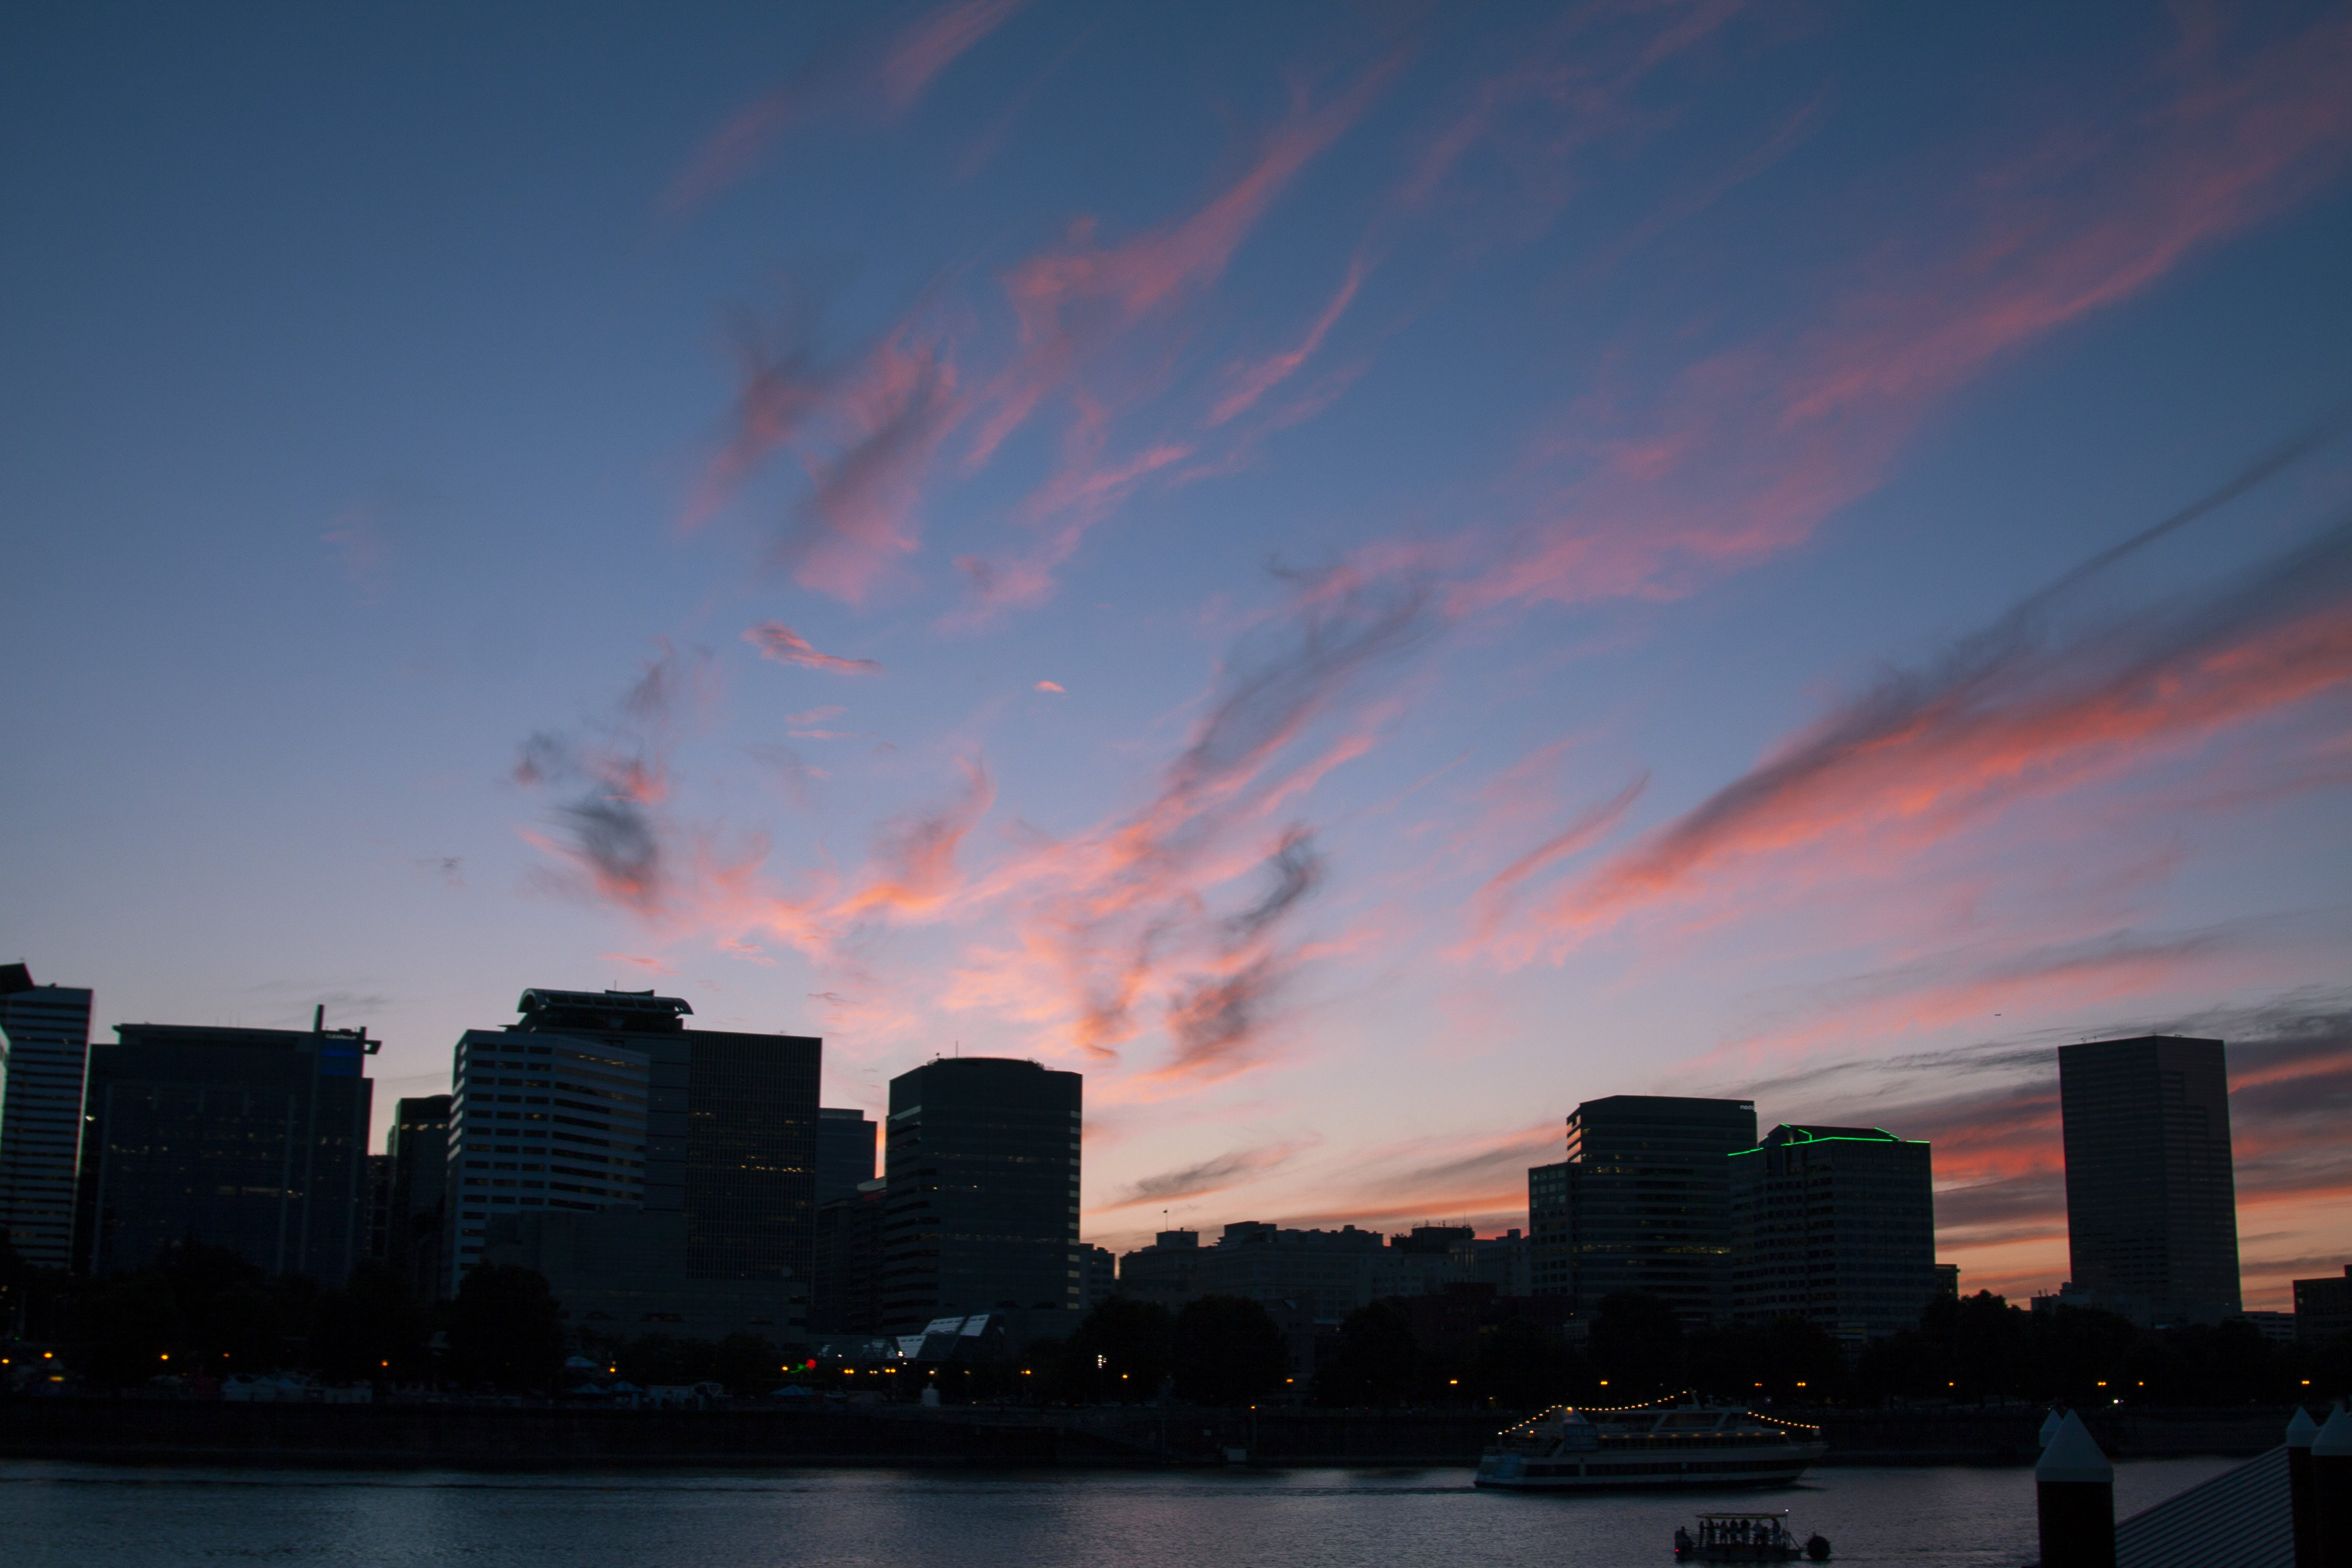 sunsuet, 城市, 水邊, 波特蘭 的 免费素材照片